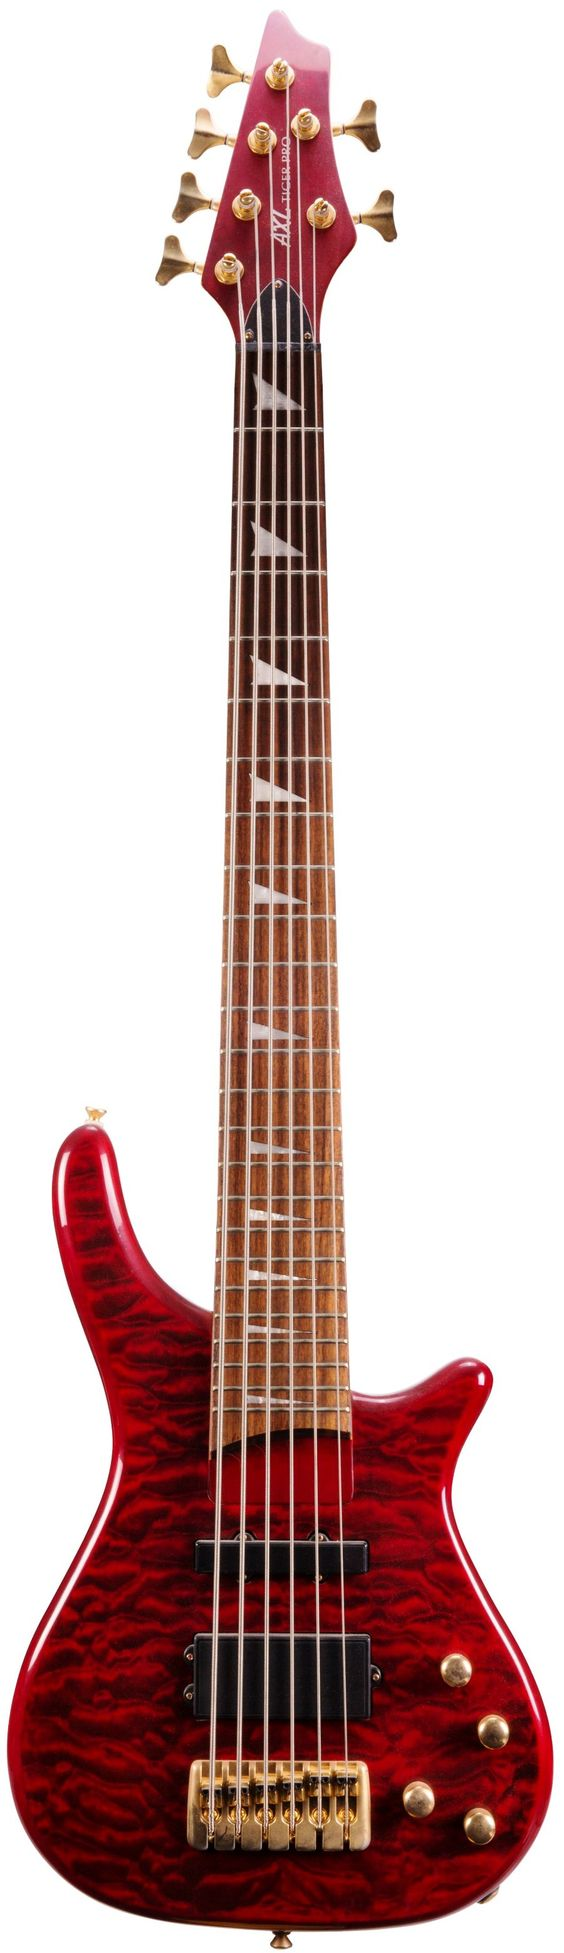 AXL Tiger pro 6 string bass